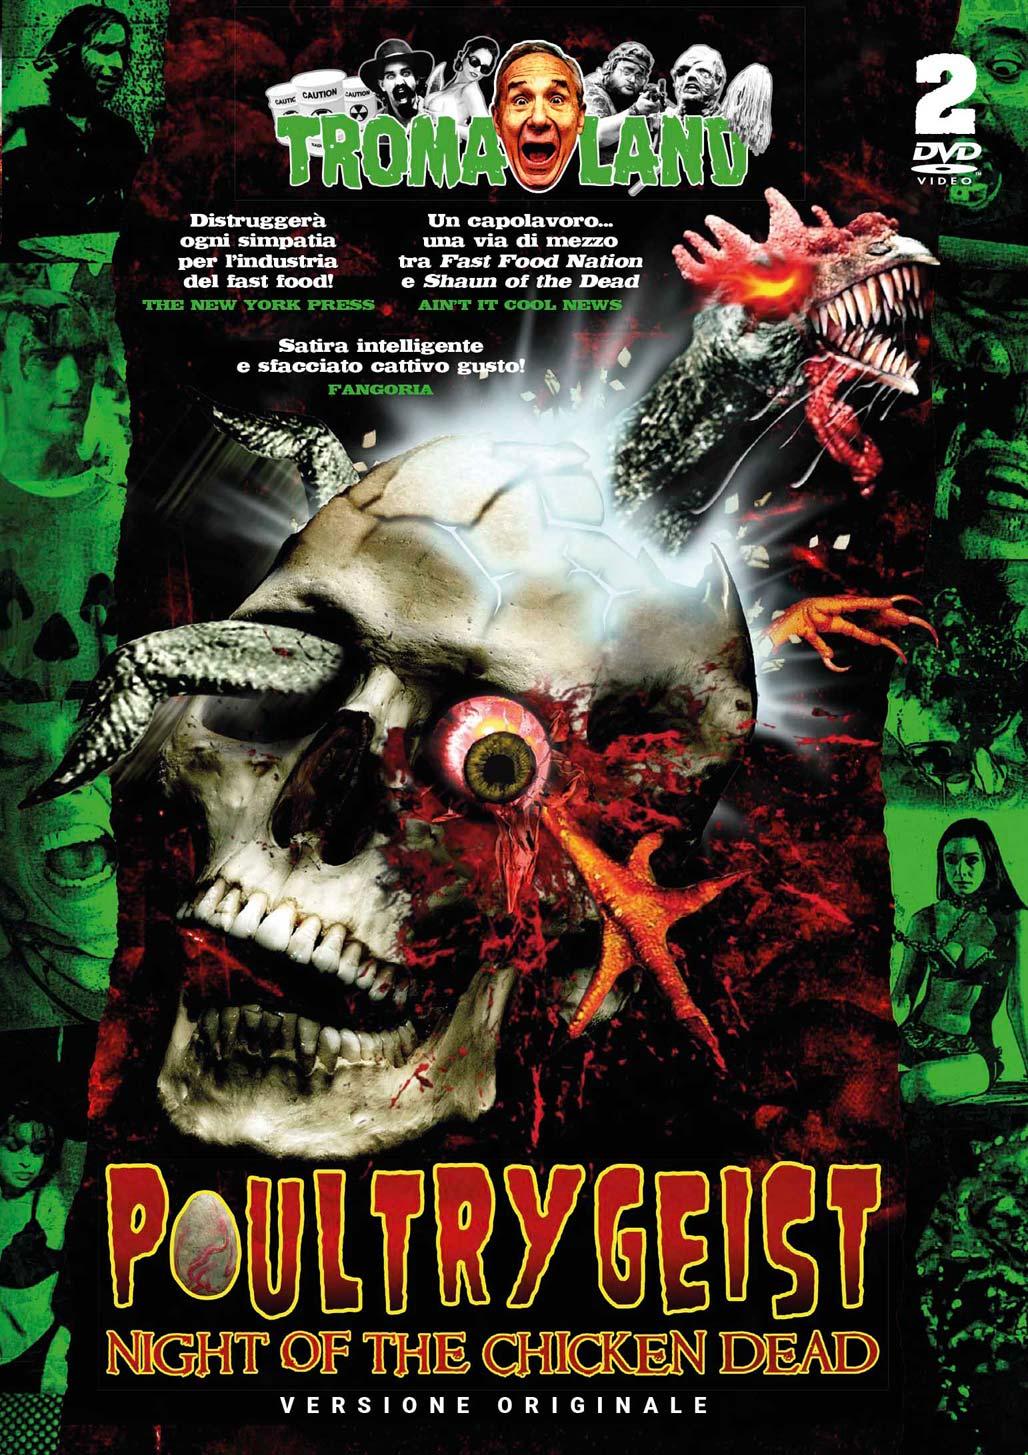 POULTRYGEIST - NIGHT OF THE CHICKEN DEAD (2 DVD) - AUDIO INLGESE